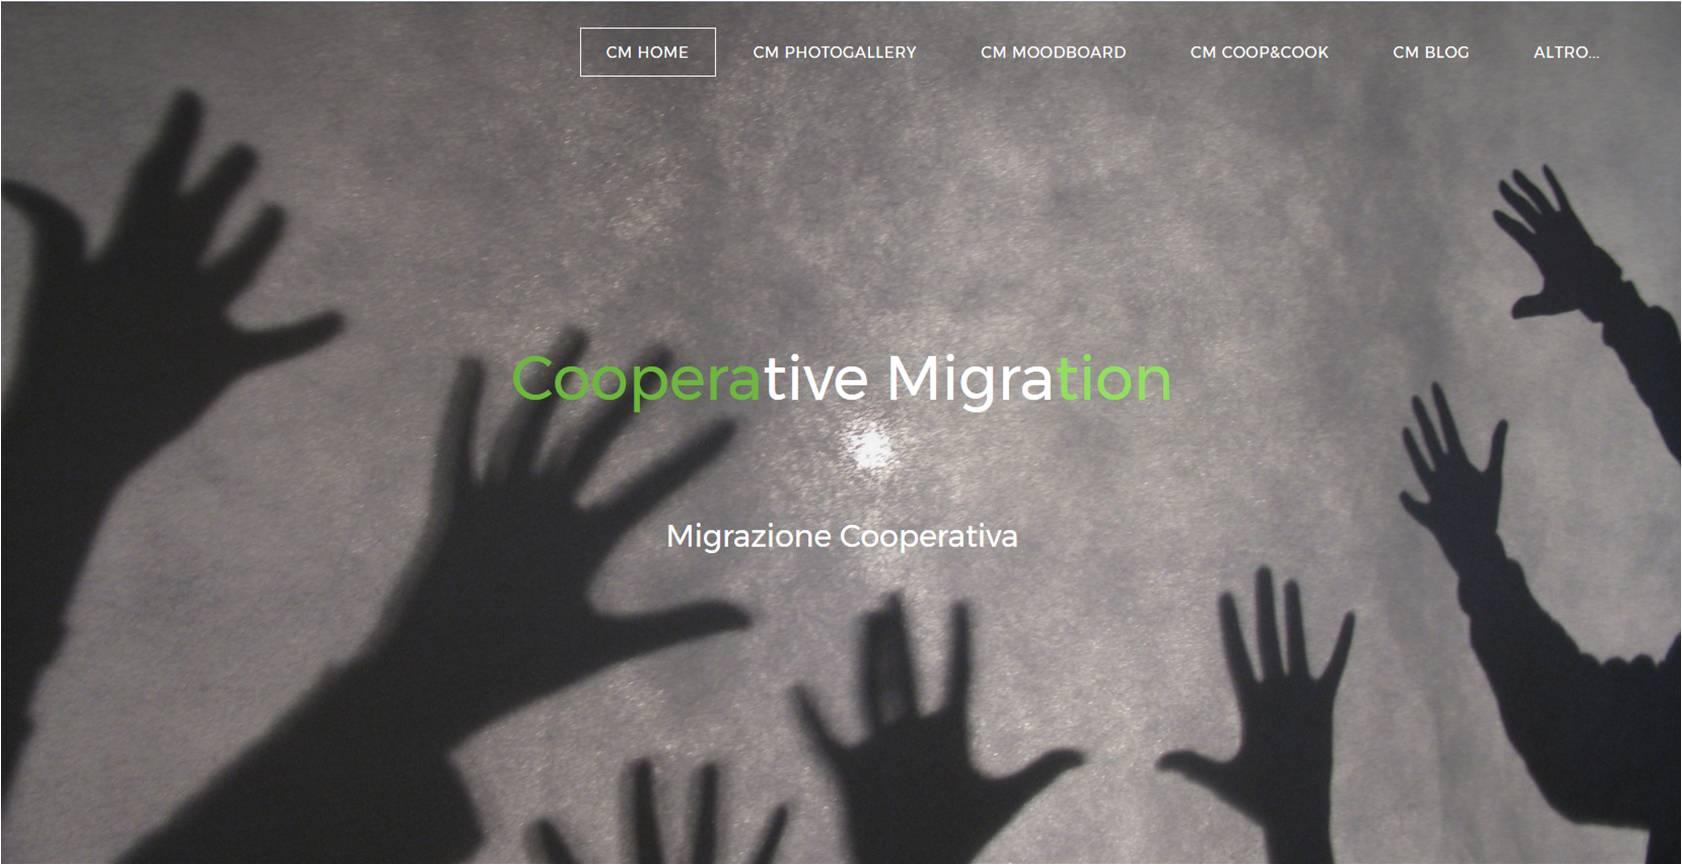 Cooperative Migration